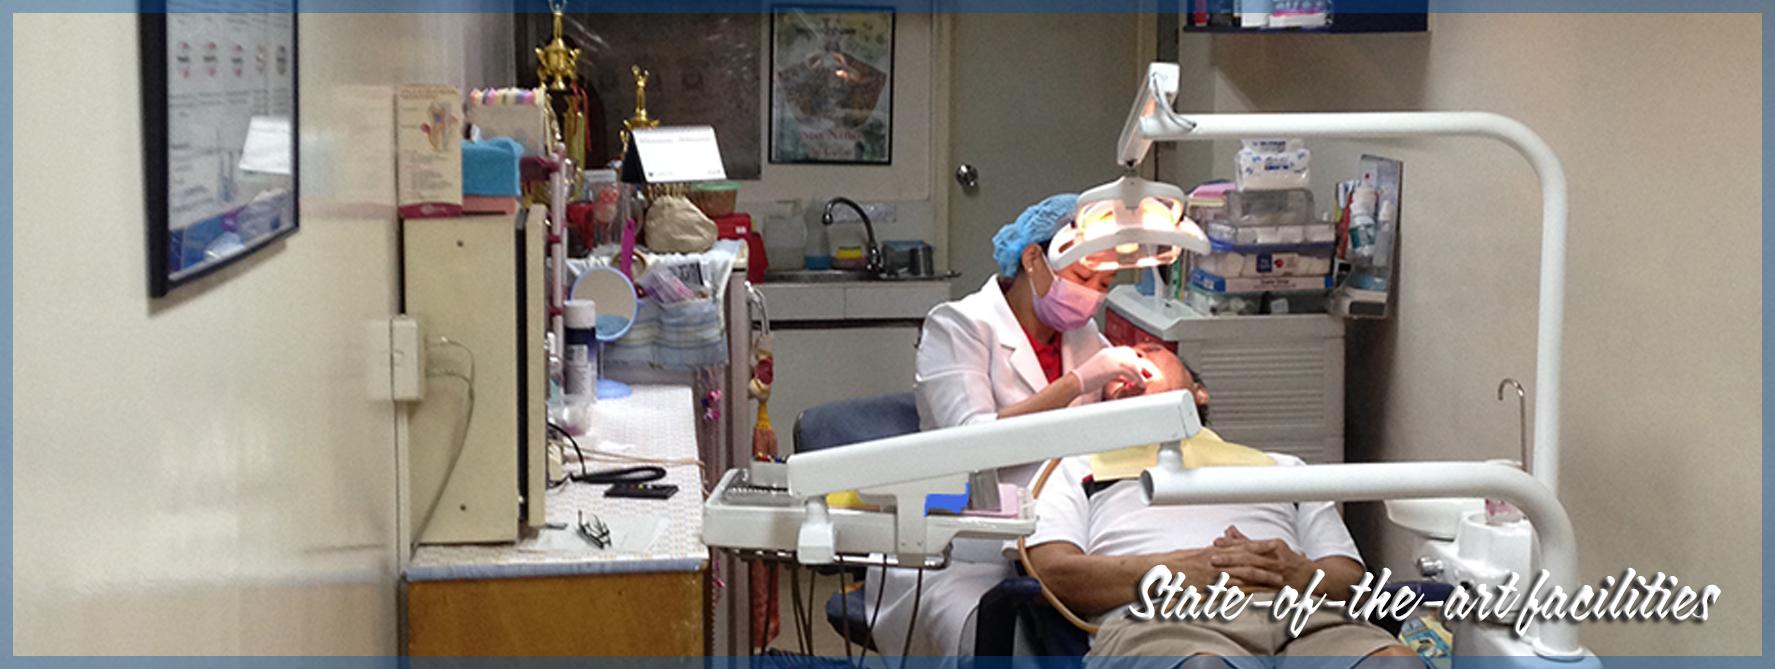 Mount Sinai Dental Clinic